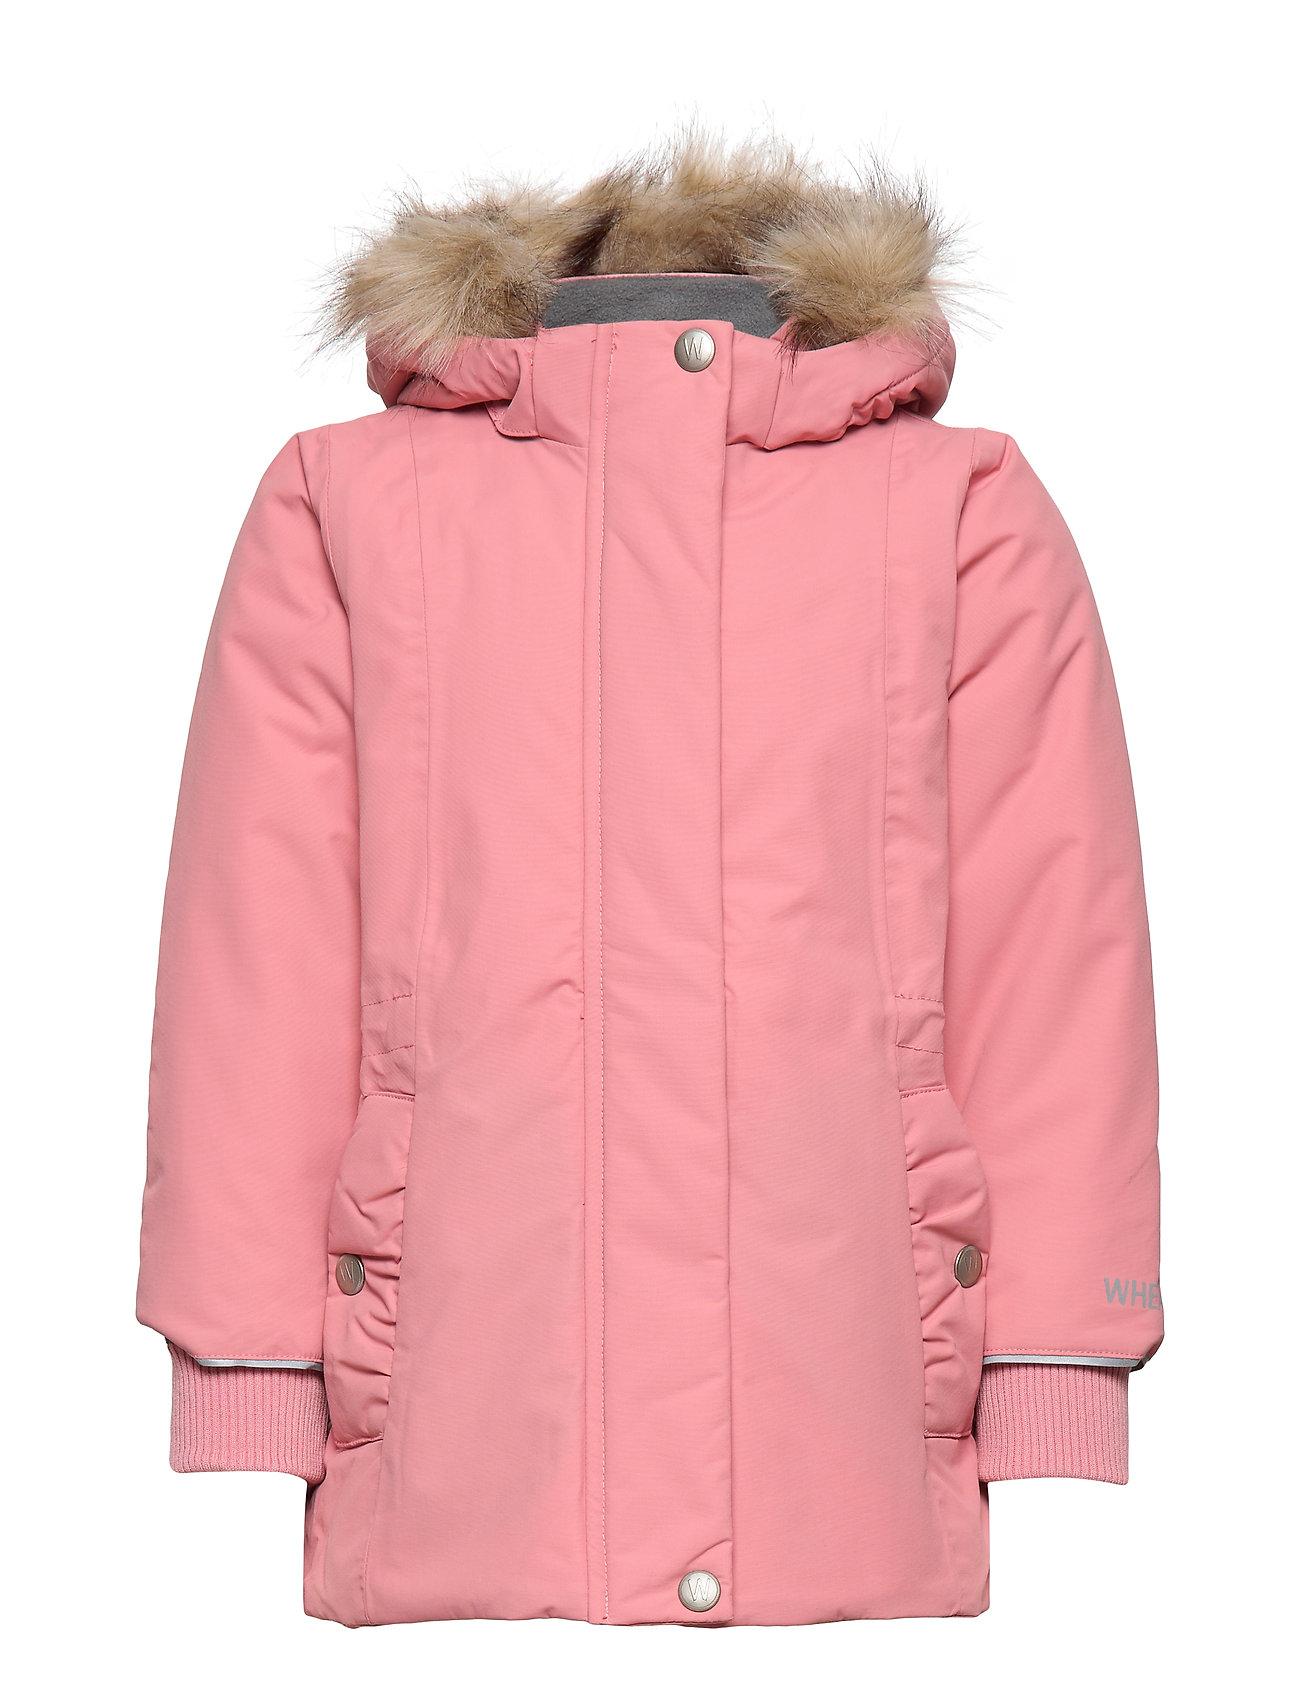 Wheat Jacket Elice - SOFT PEACH ROSE